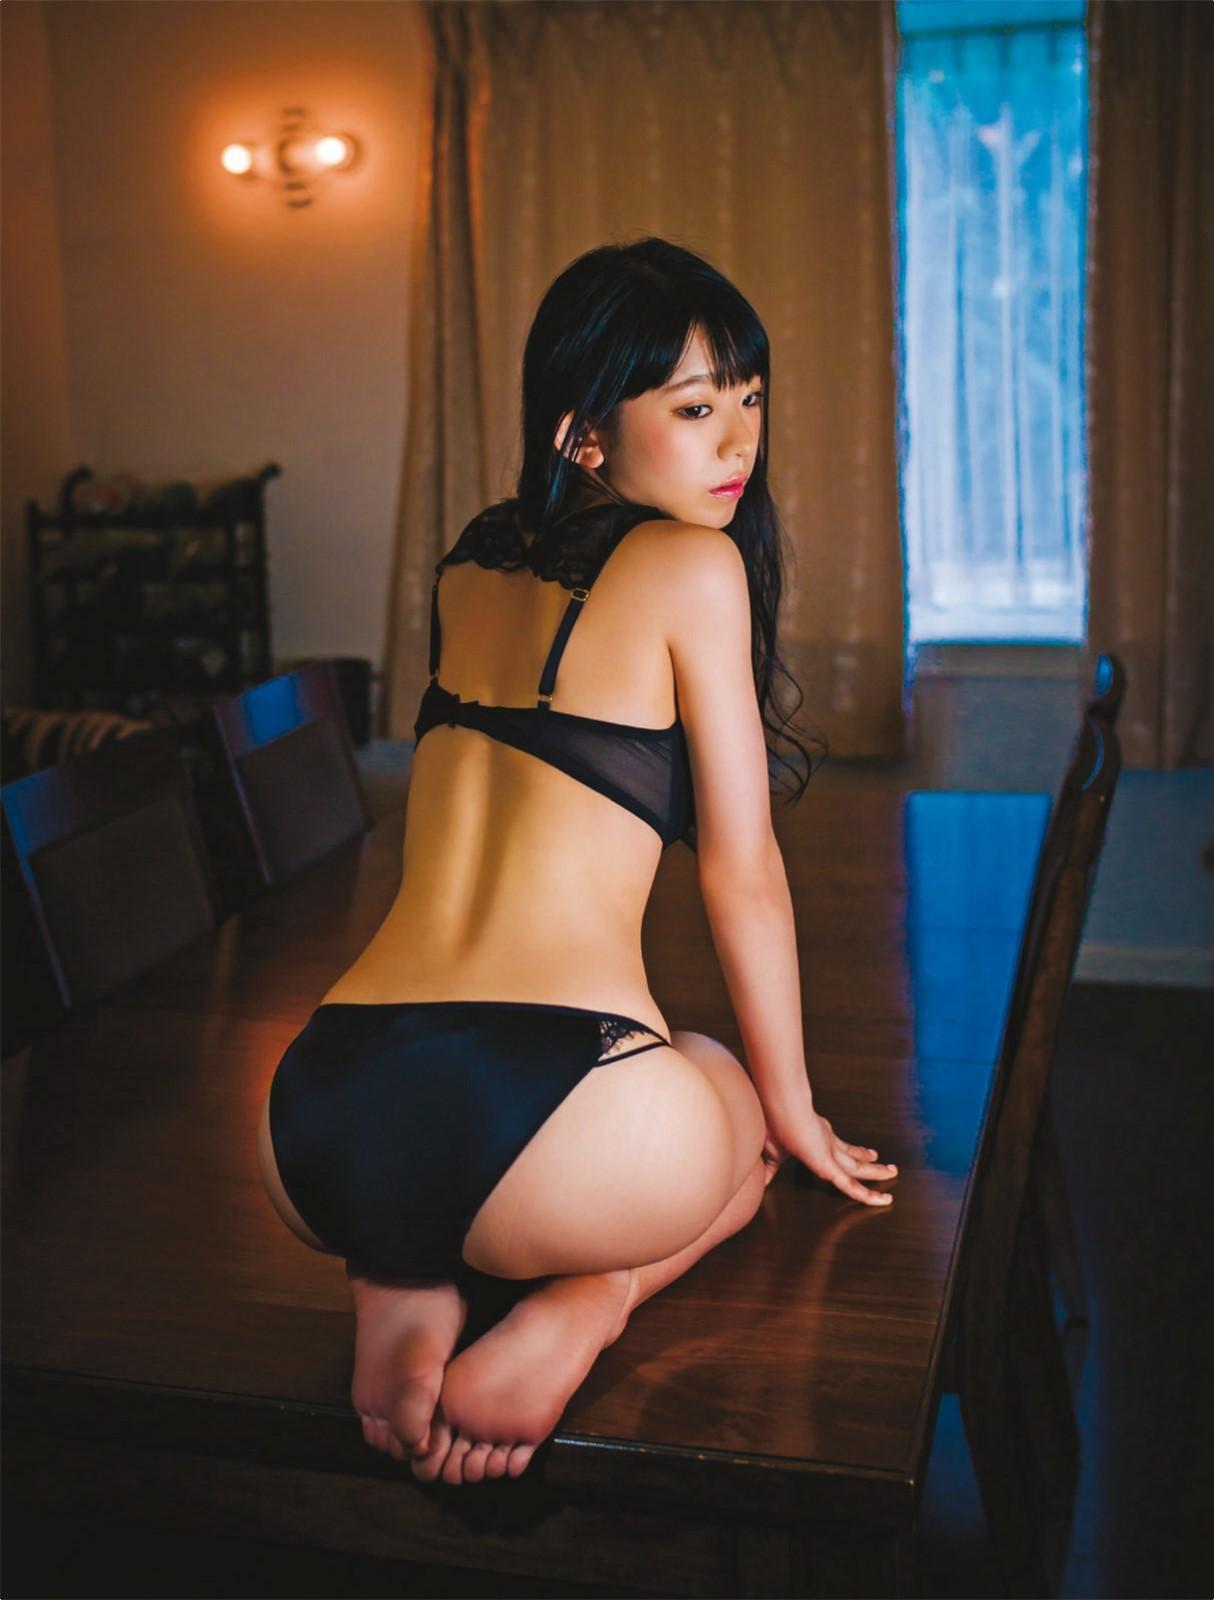 Nagasawa Marina 長澤茉里奈, Shukan SPA! 2017.08.01 (週刊スパ 2017年08月01日号)